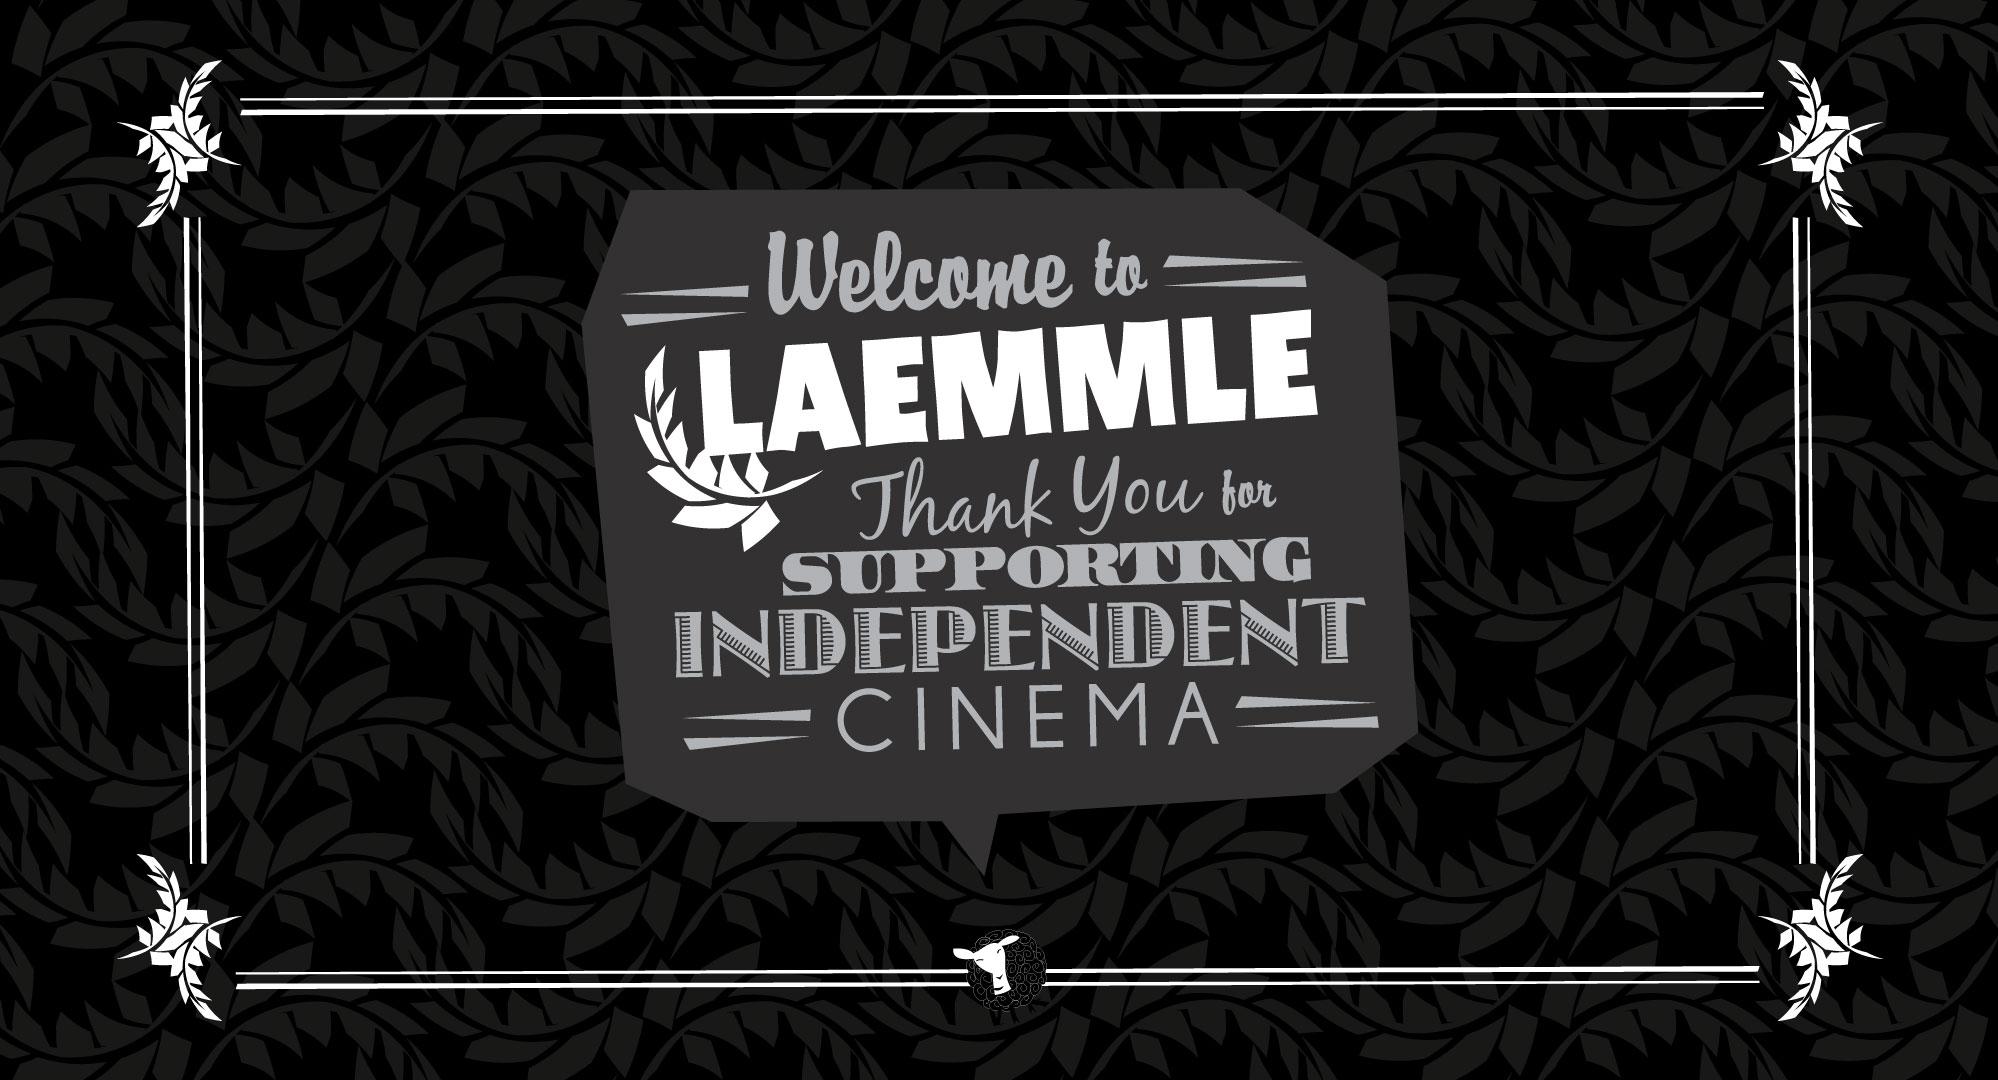 Laemmle_TheaterSlides_PreRoll_1_Welcome.jpg